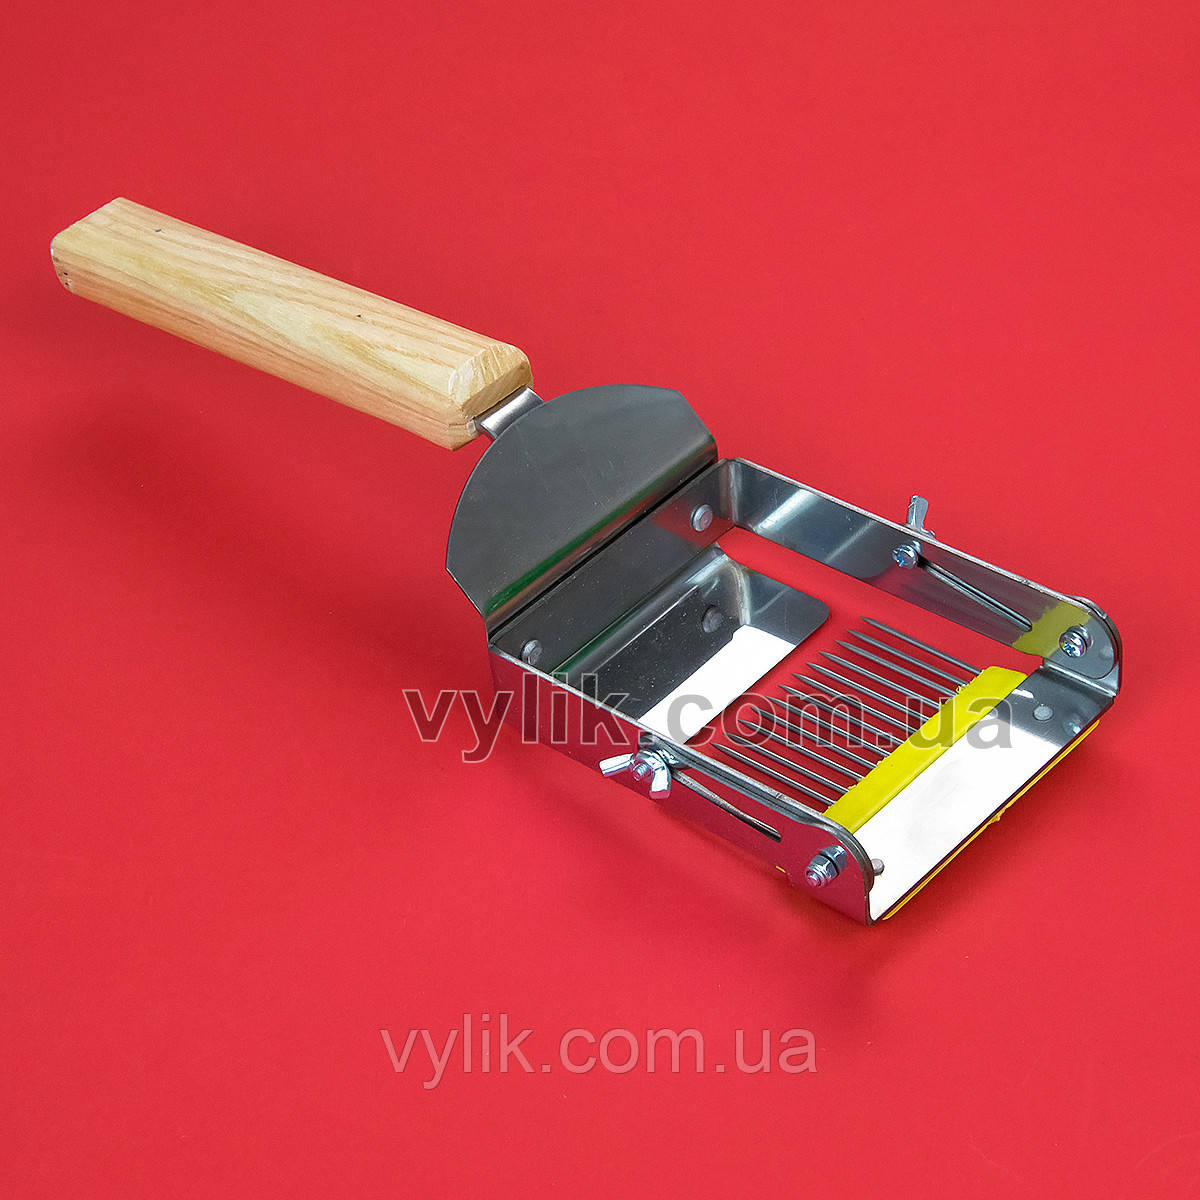 Вилка культиватор (аналог Культиватор Кузина), для распечатки сот